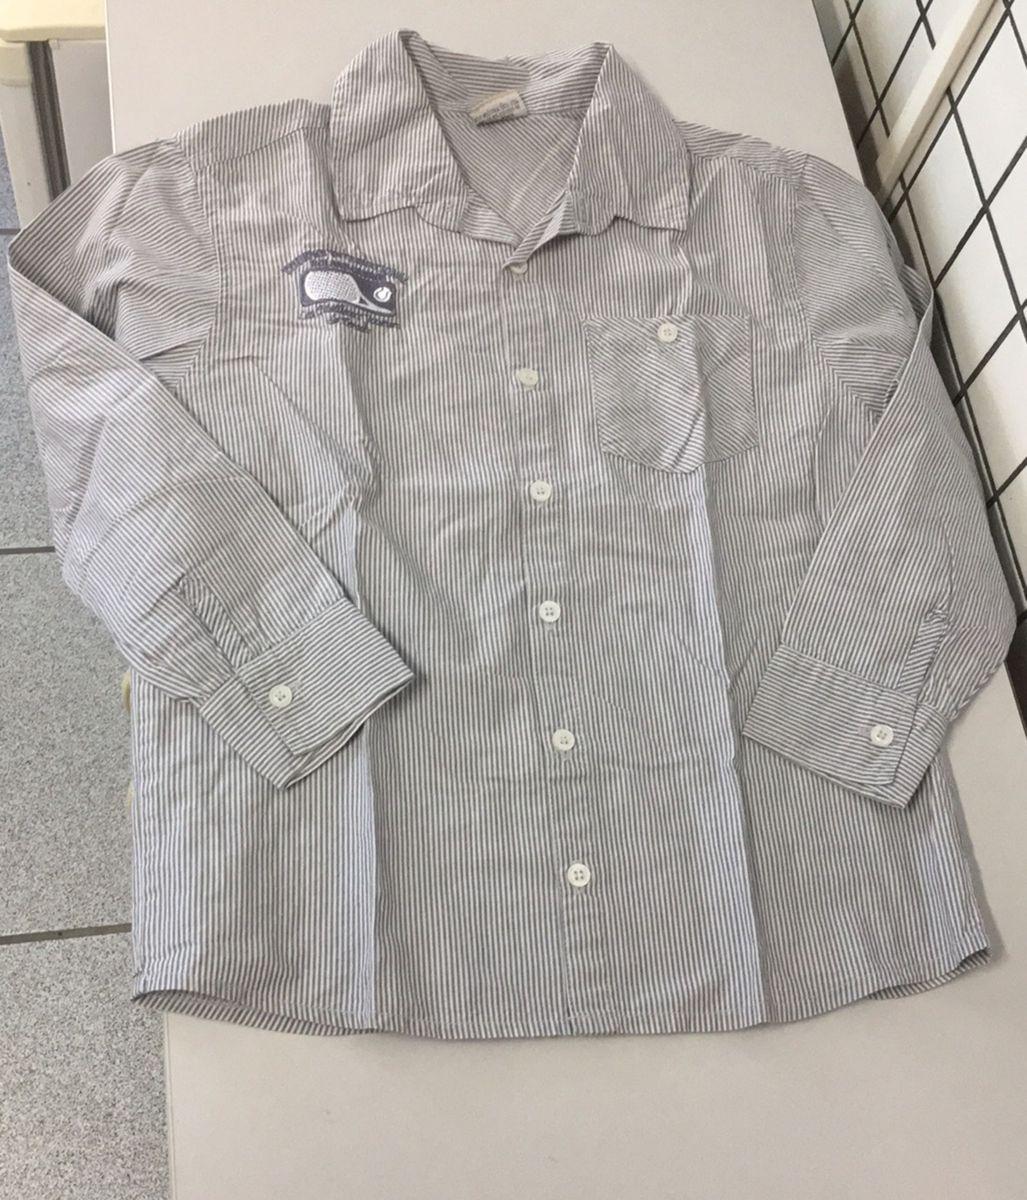 944395d3b47 camisa infantil tamanho 12 milon - infantil - menino milon